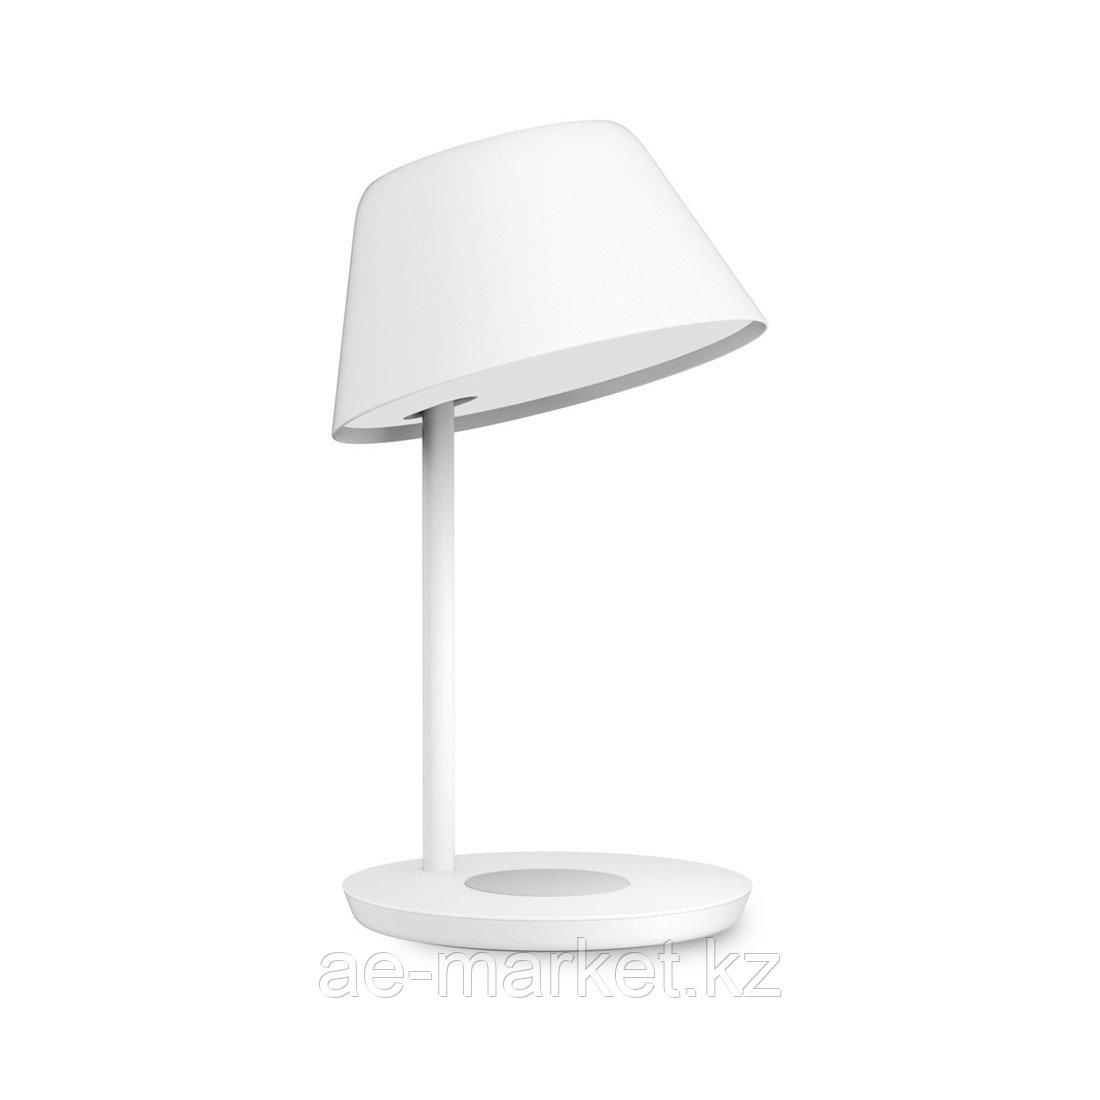 Настольная лампа Xiaomi Yeelight Staria Bedside Lamp Pro